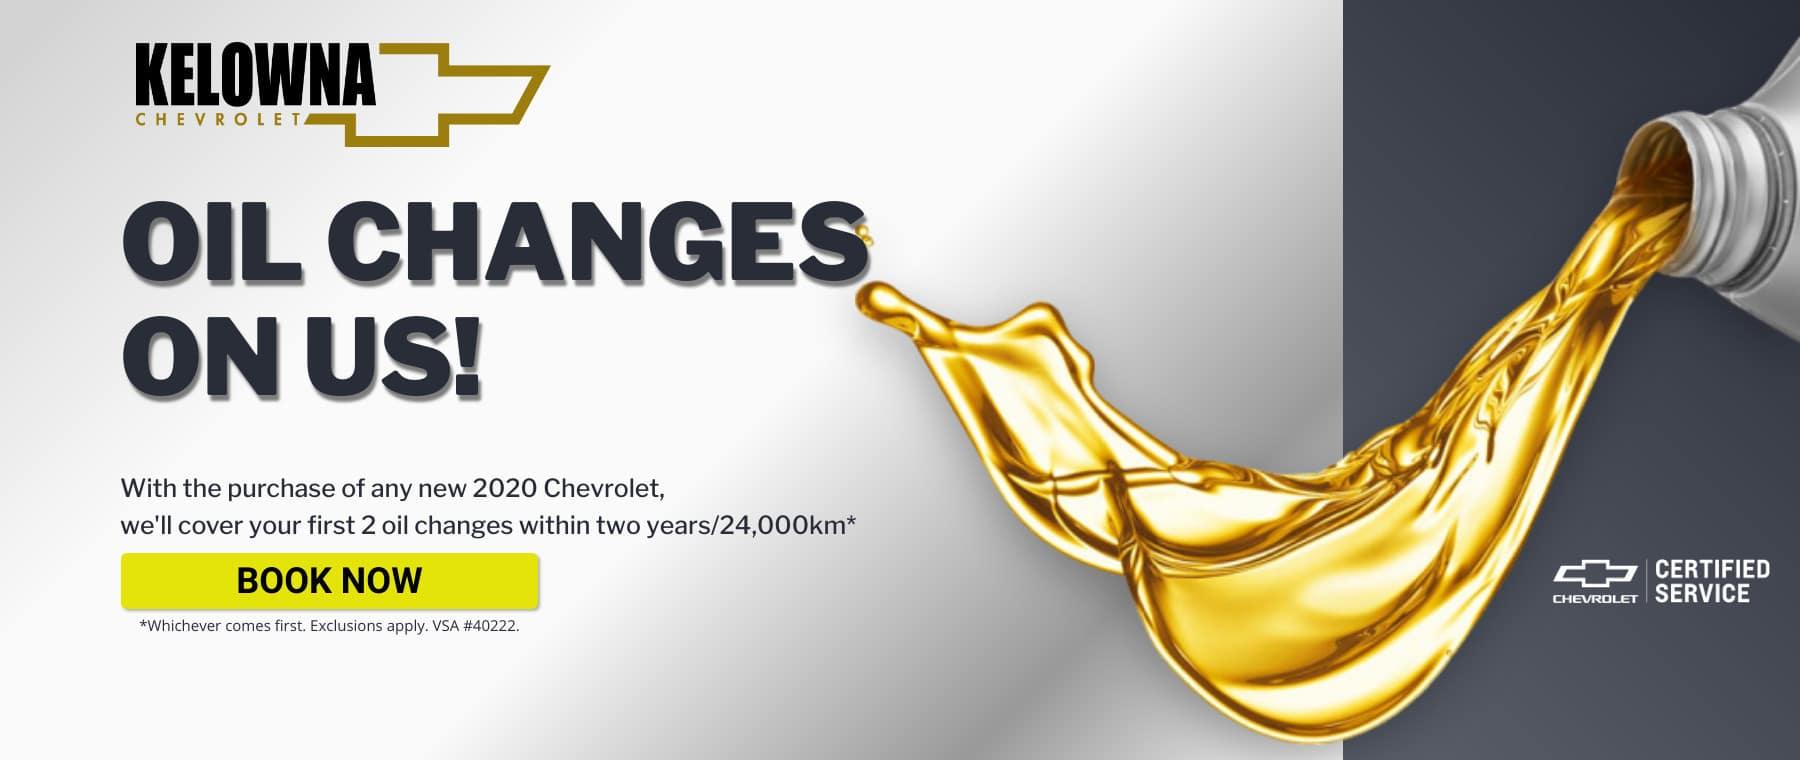 Certified Service – KLC-1800x760px-Customsize-High-Quality (1)